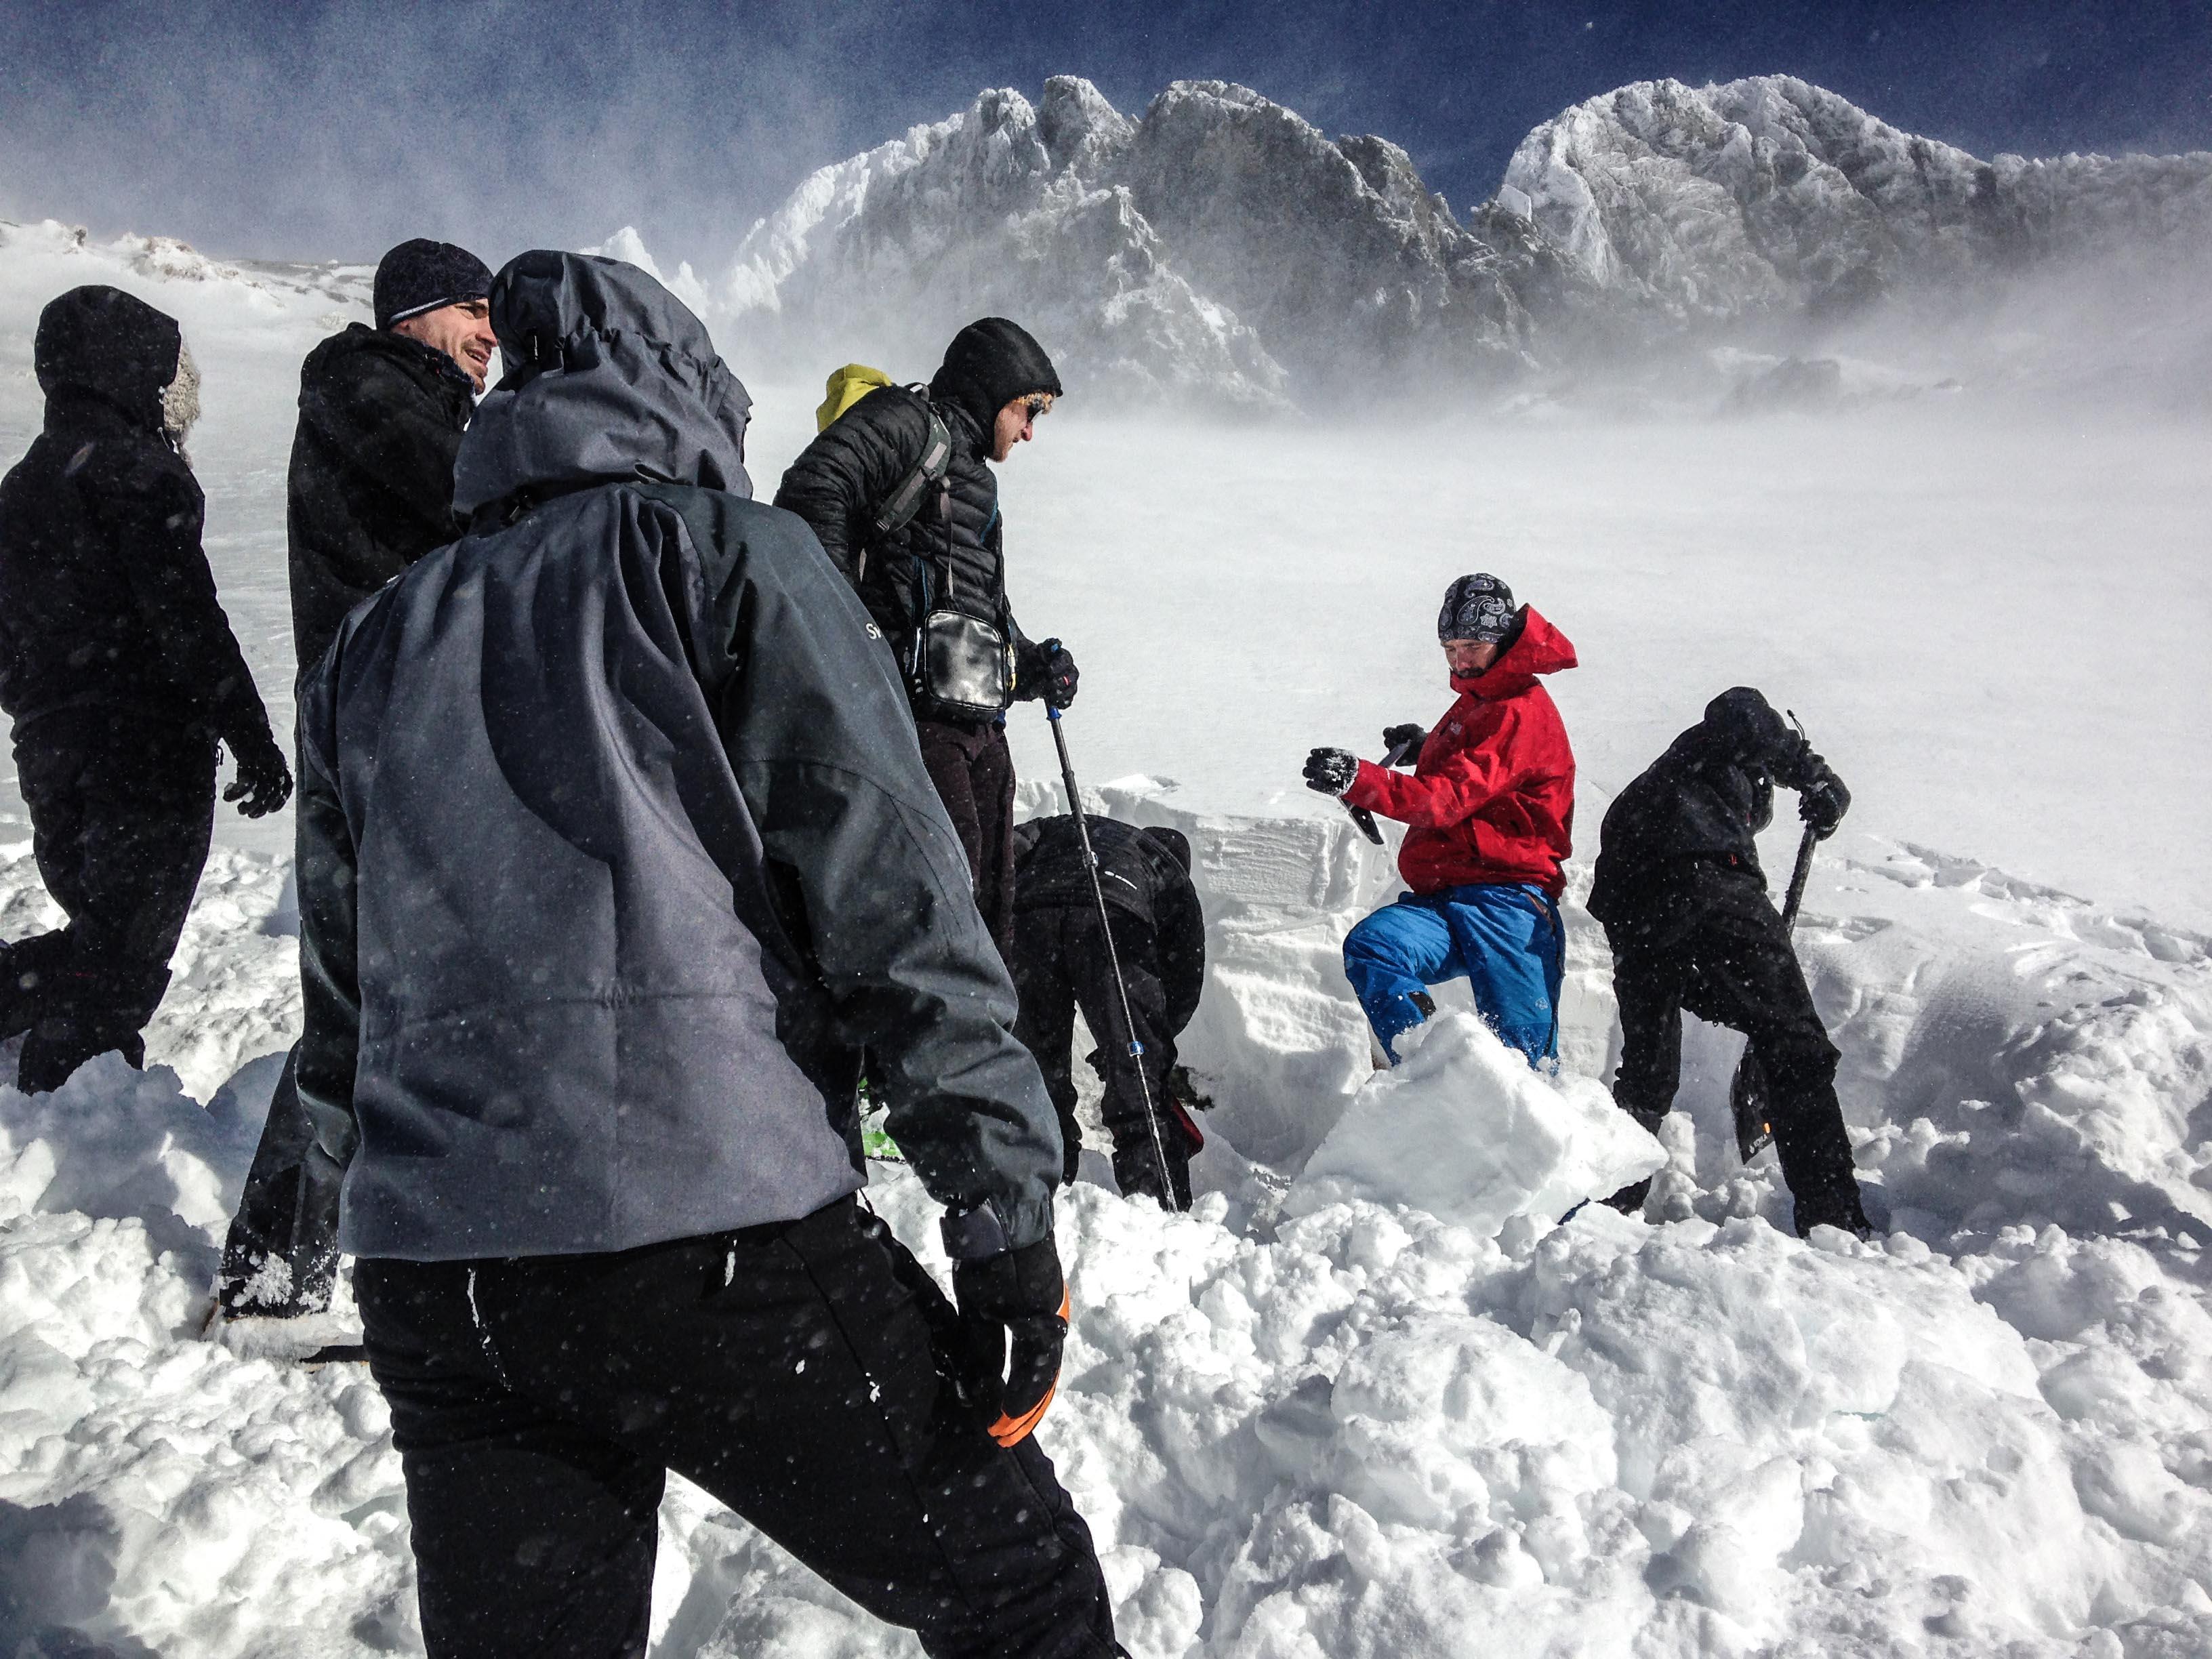 lavínový kurz 2017 vysoké tatry zbojnícka chata